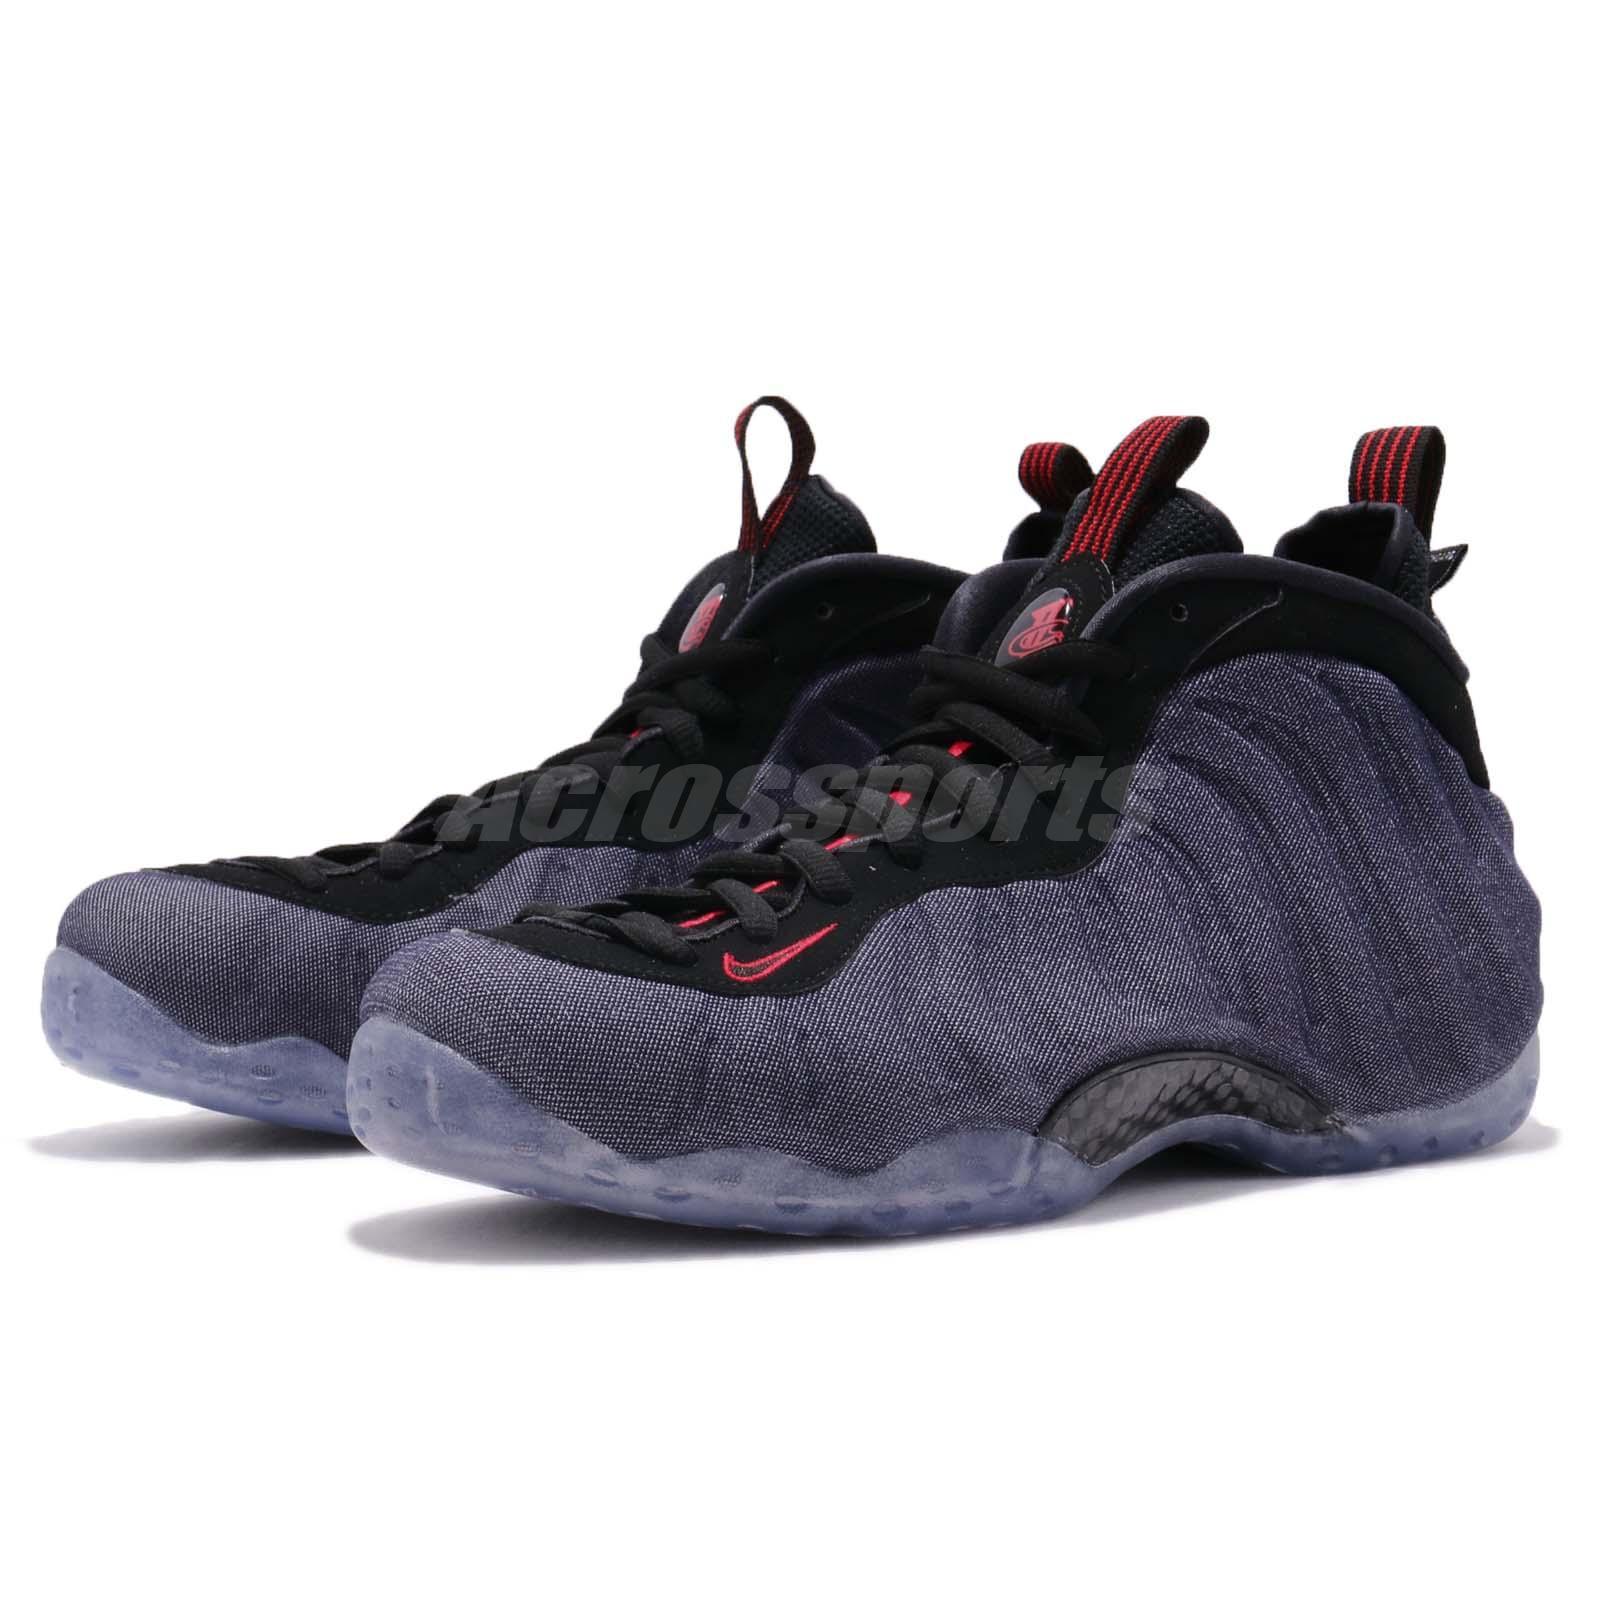 022c2aba6b7 Nike Air Foamposite One Obsidian Denim Penny Hardaway Retro 1 314996 ...